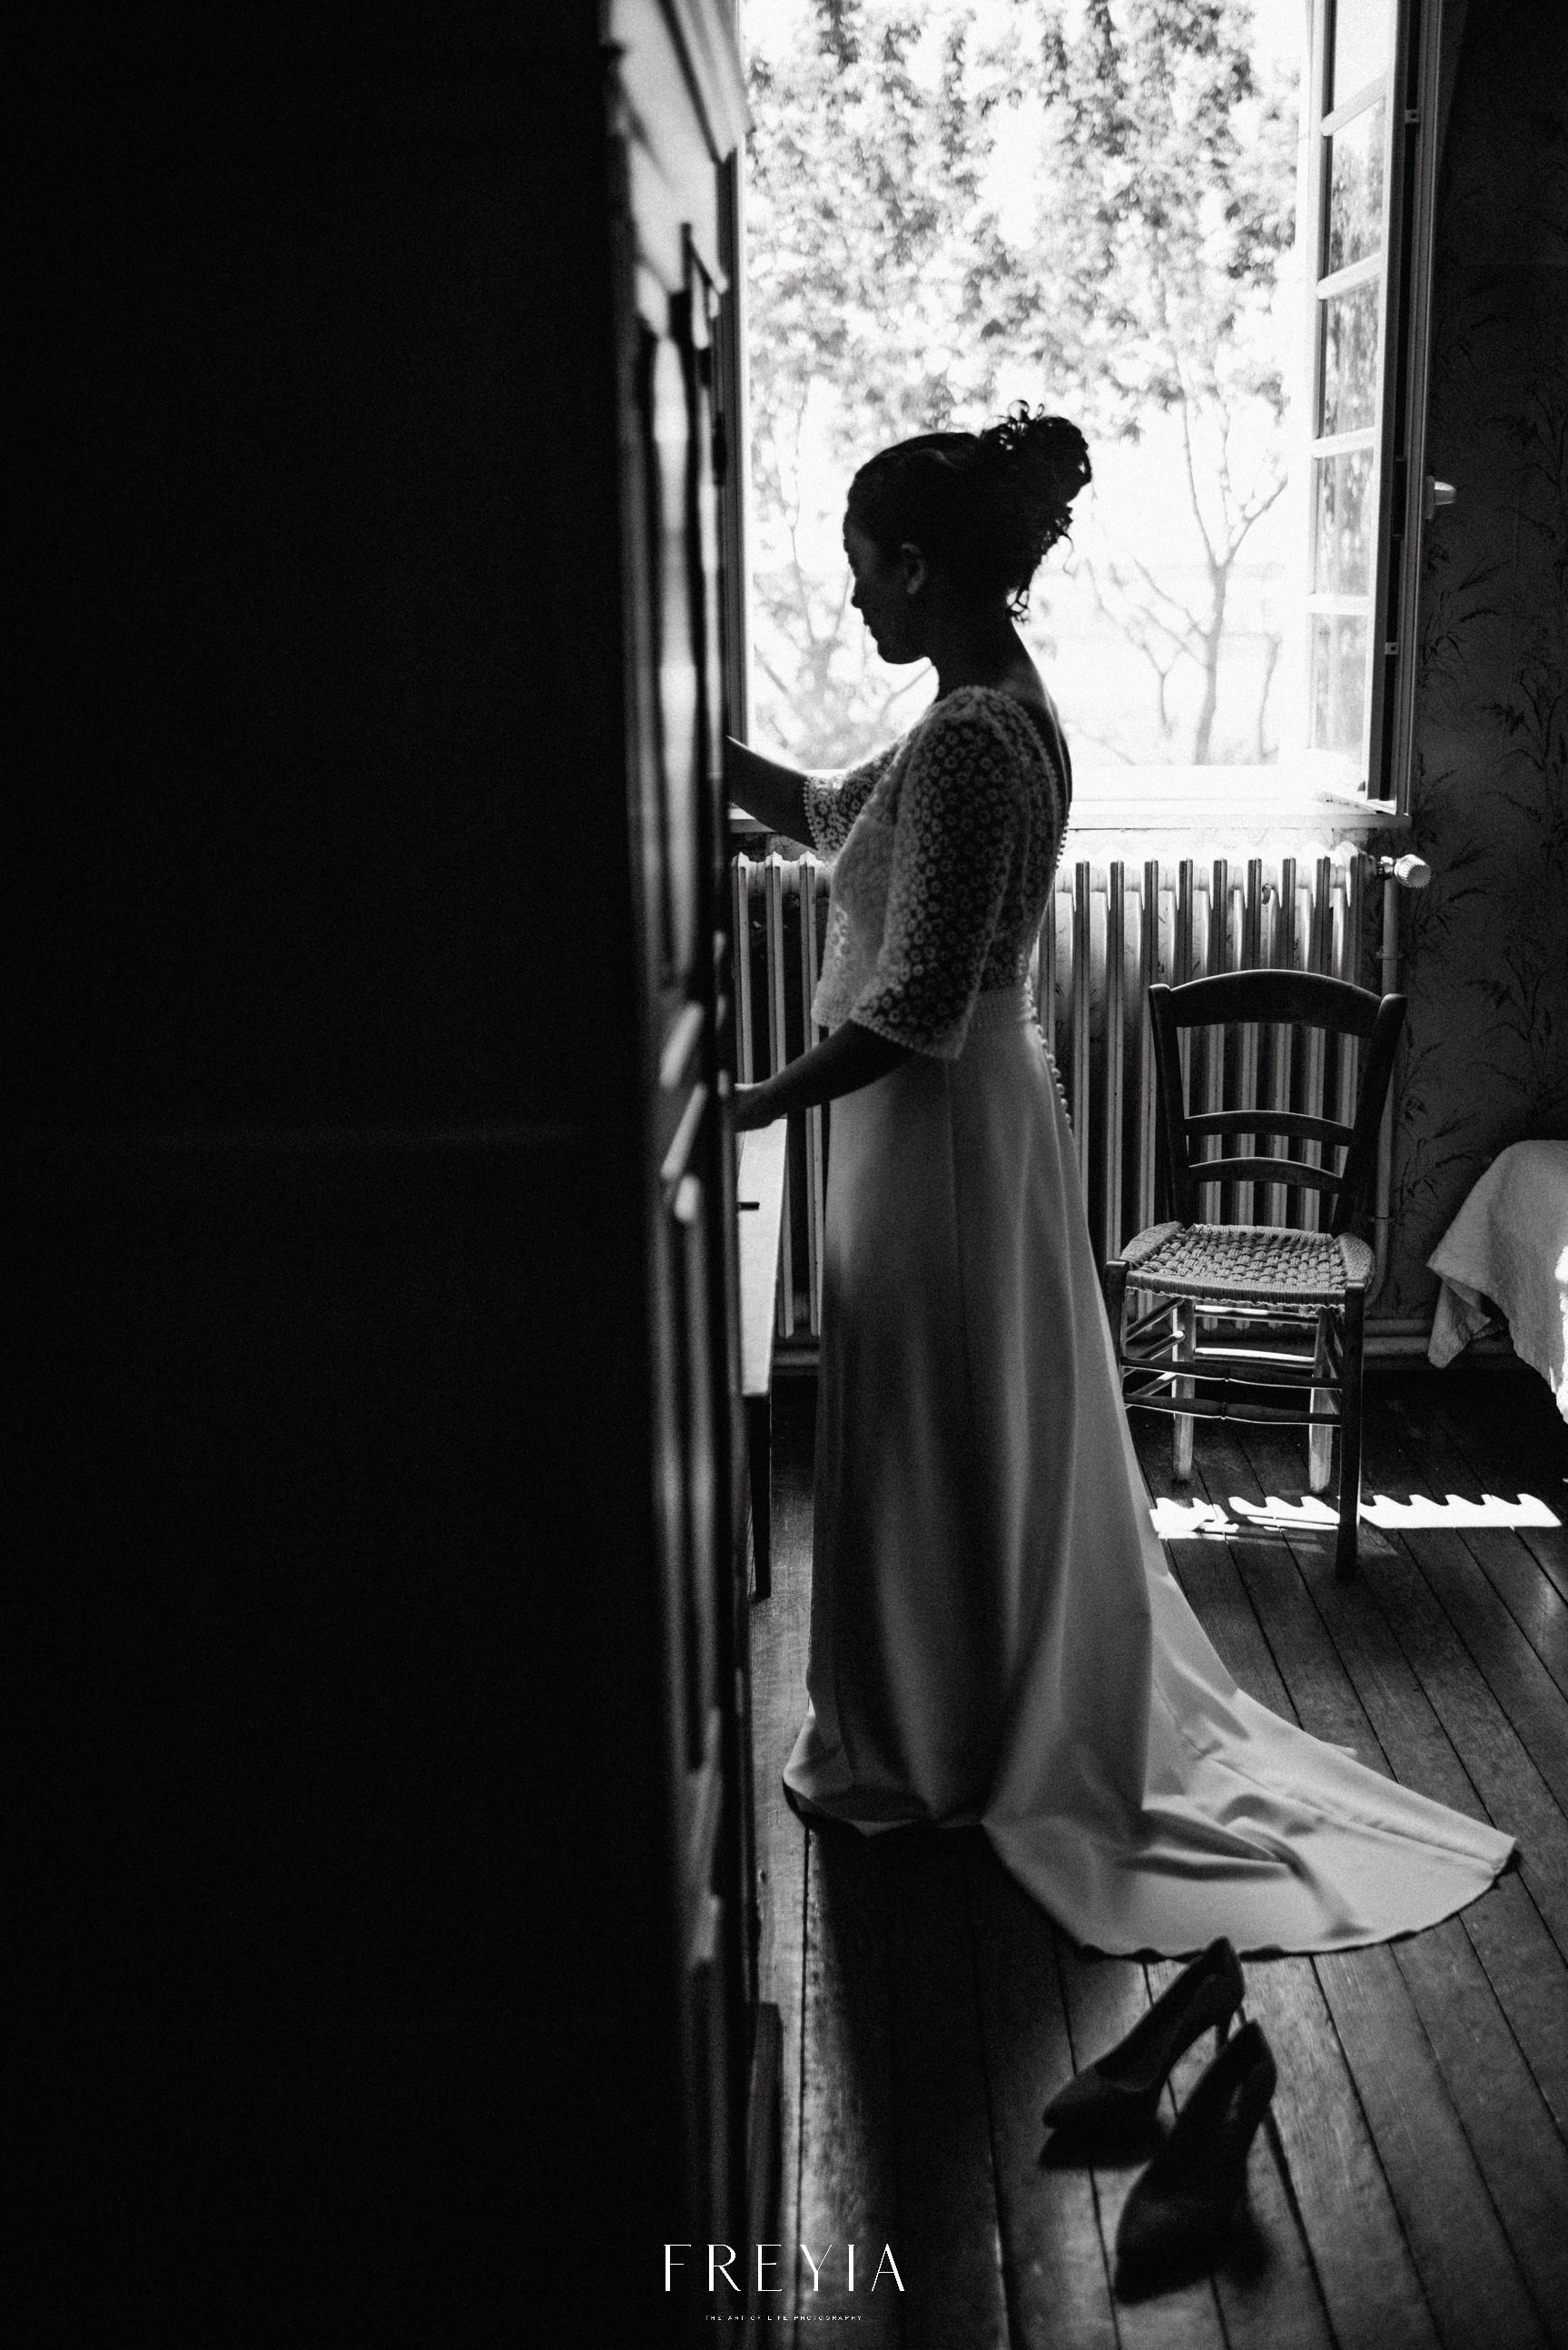 R + T |  mariage reportage alternatif moody intime minimaliste vintage naturel boho boheme |  PHOTOGRAPHE mariage PARIS france destination  | FREYIA photography_-77.jpg